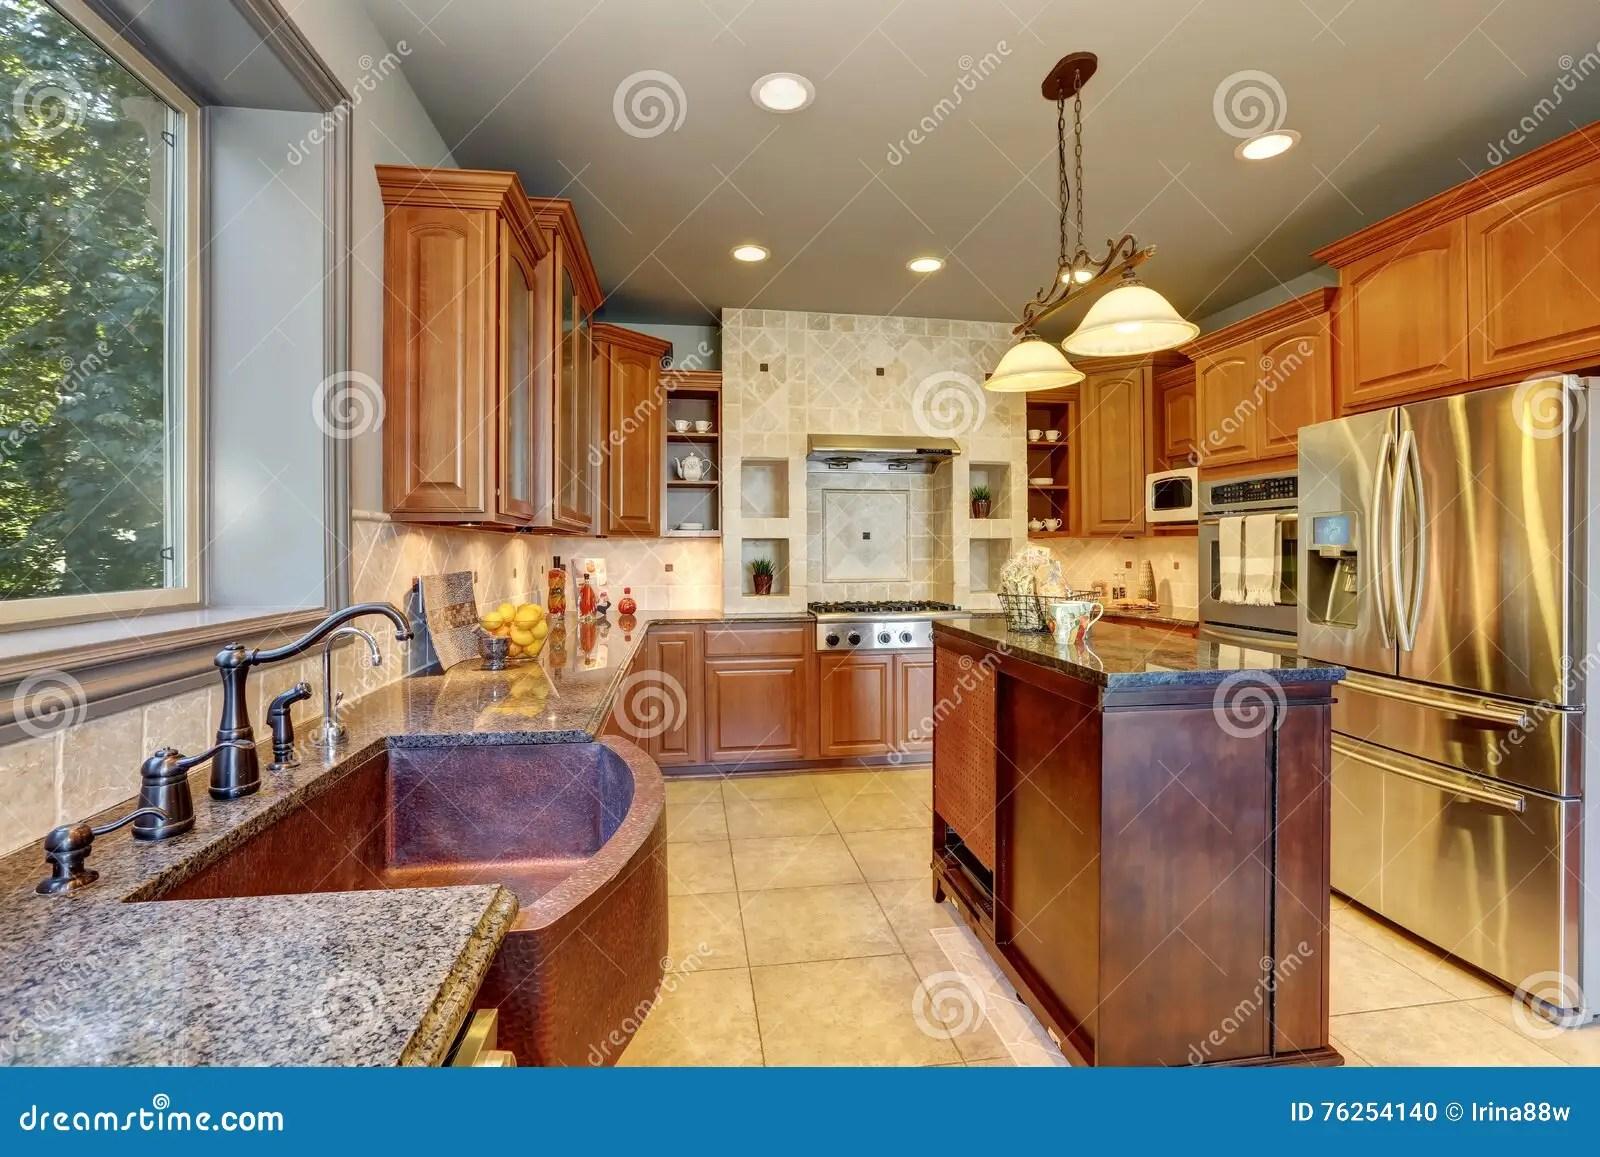 in stock kitchens kitchen cart with stainless steel top 与大钢冰箱和厨房的巨大厨房内部库存照片 图片包括有平面 内部 装备 与大钢冰箱和厨房的巨大厨房内部